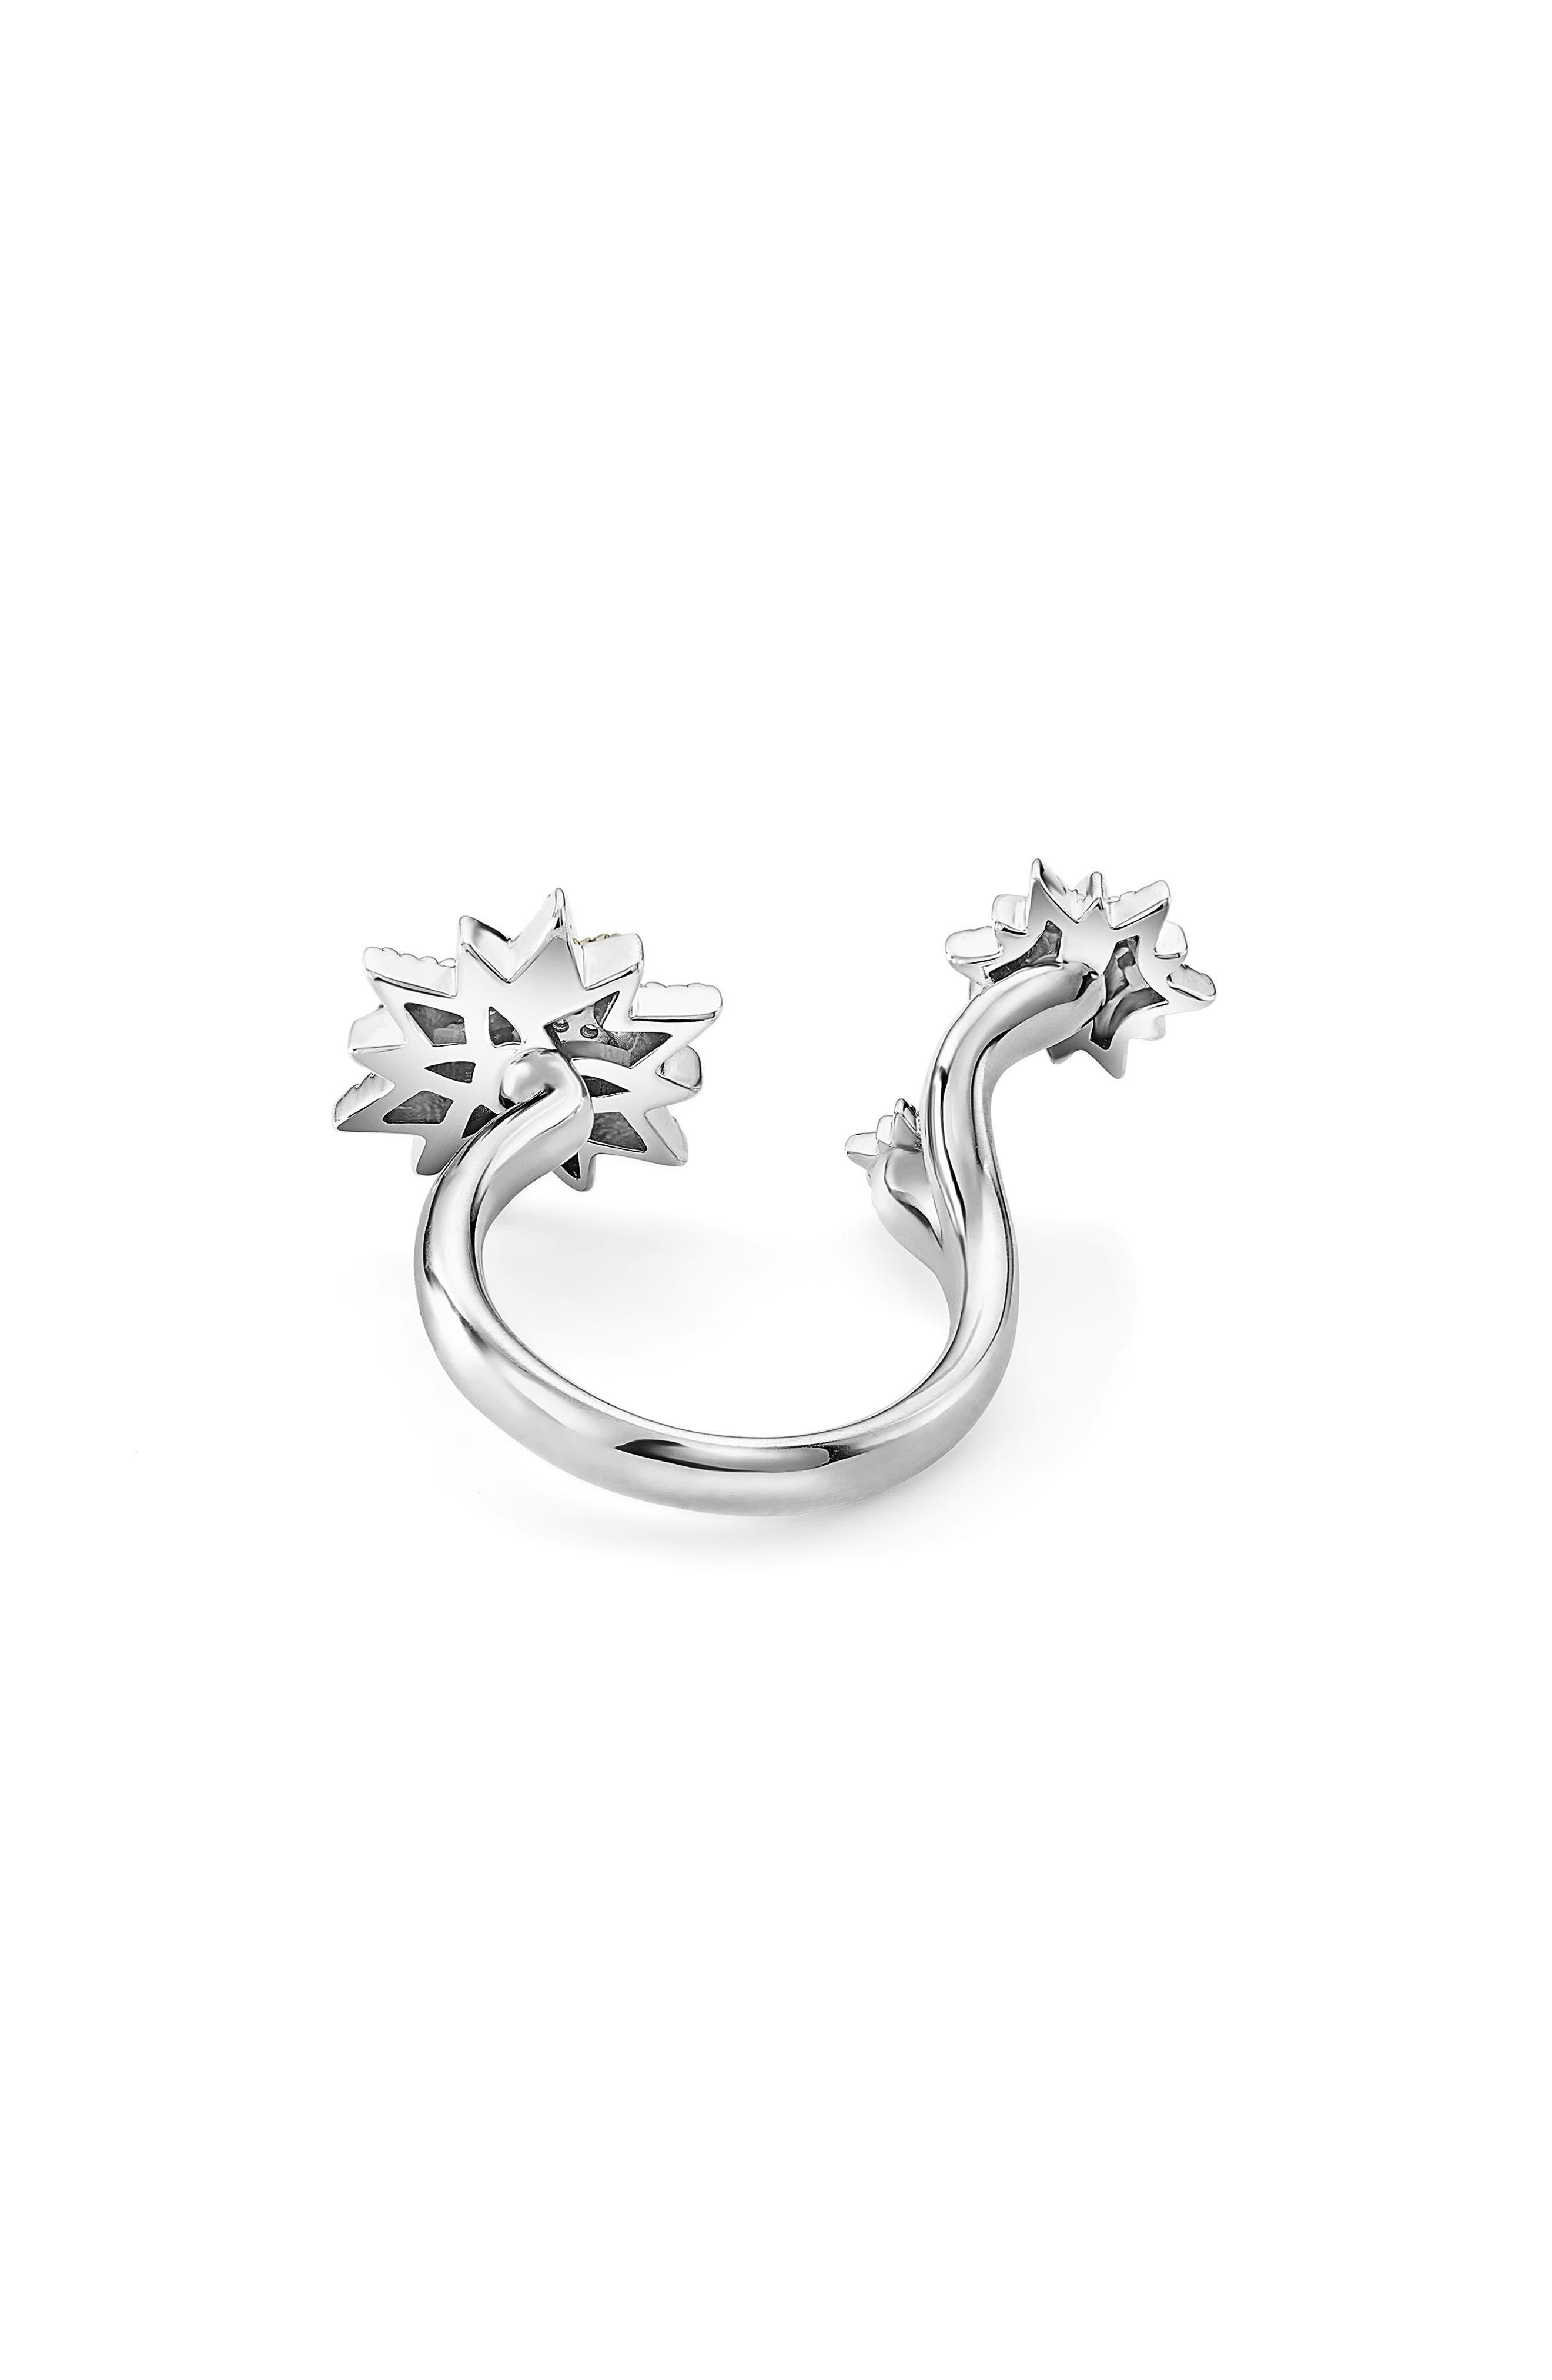 North Star Diamond Ring,                             Alternate thumbnail 5, color,                             Diamond